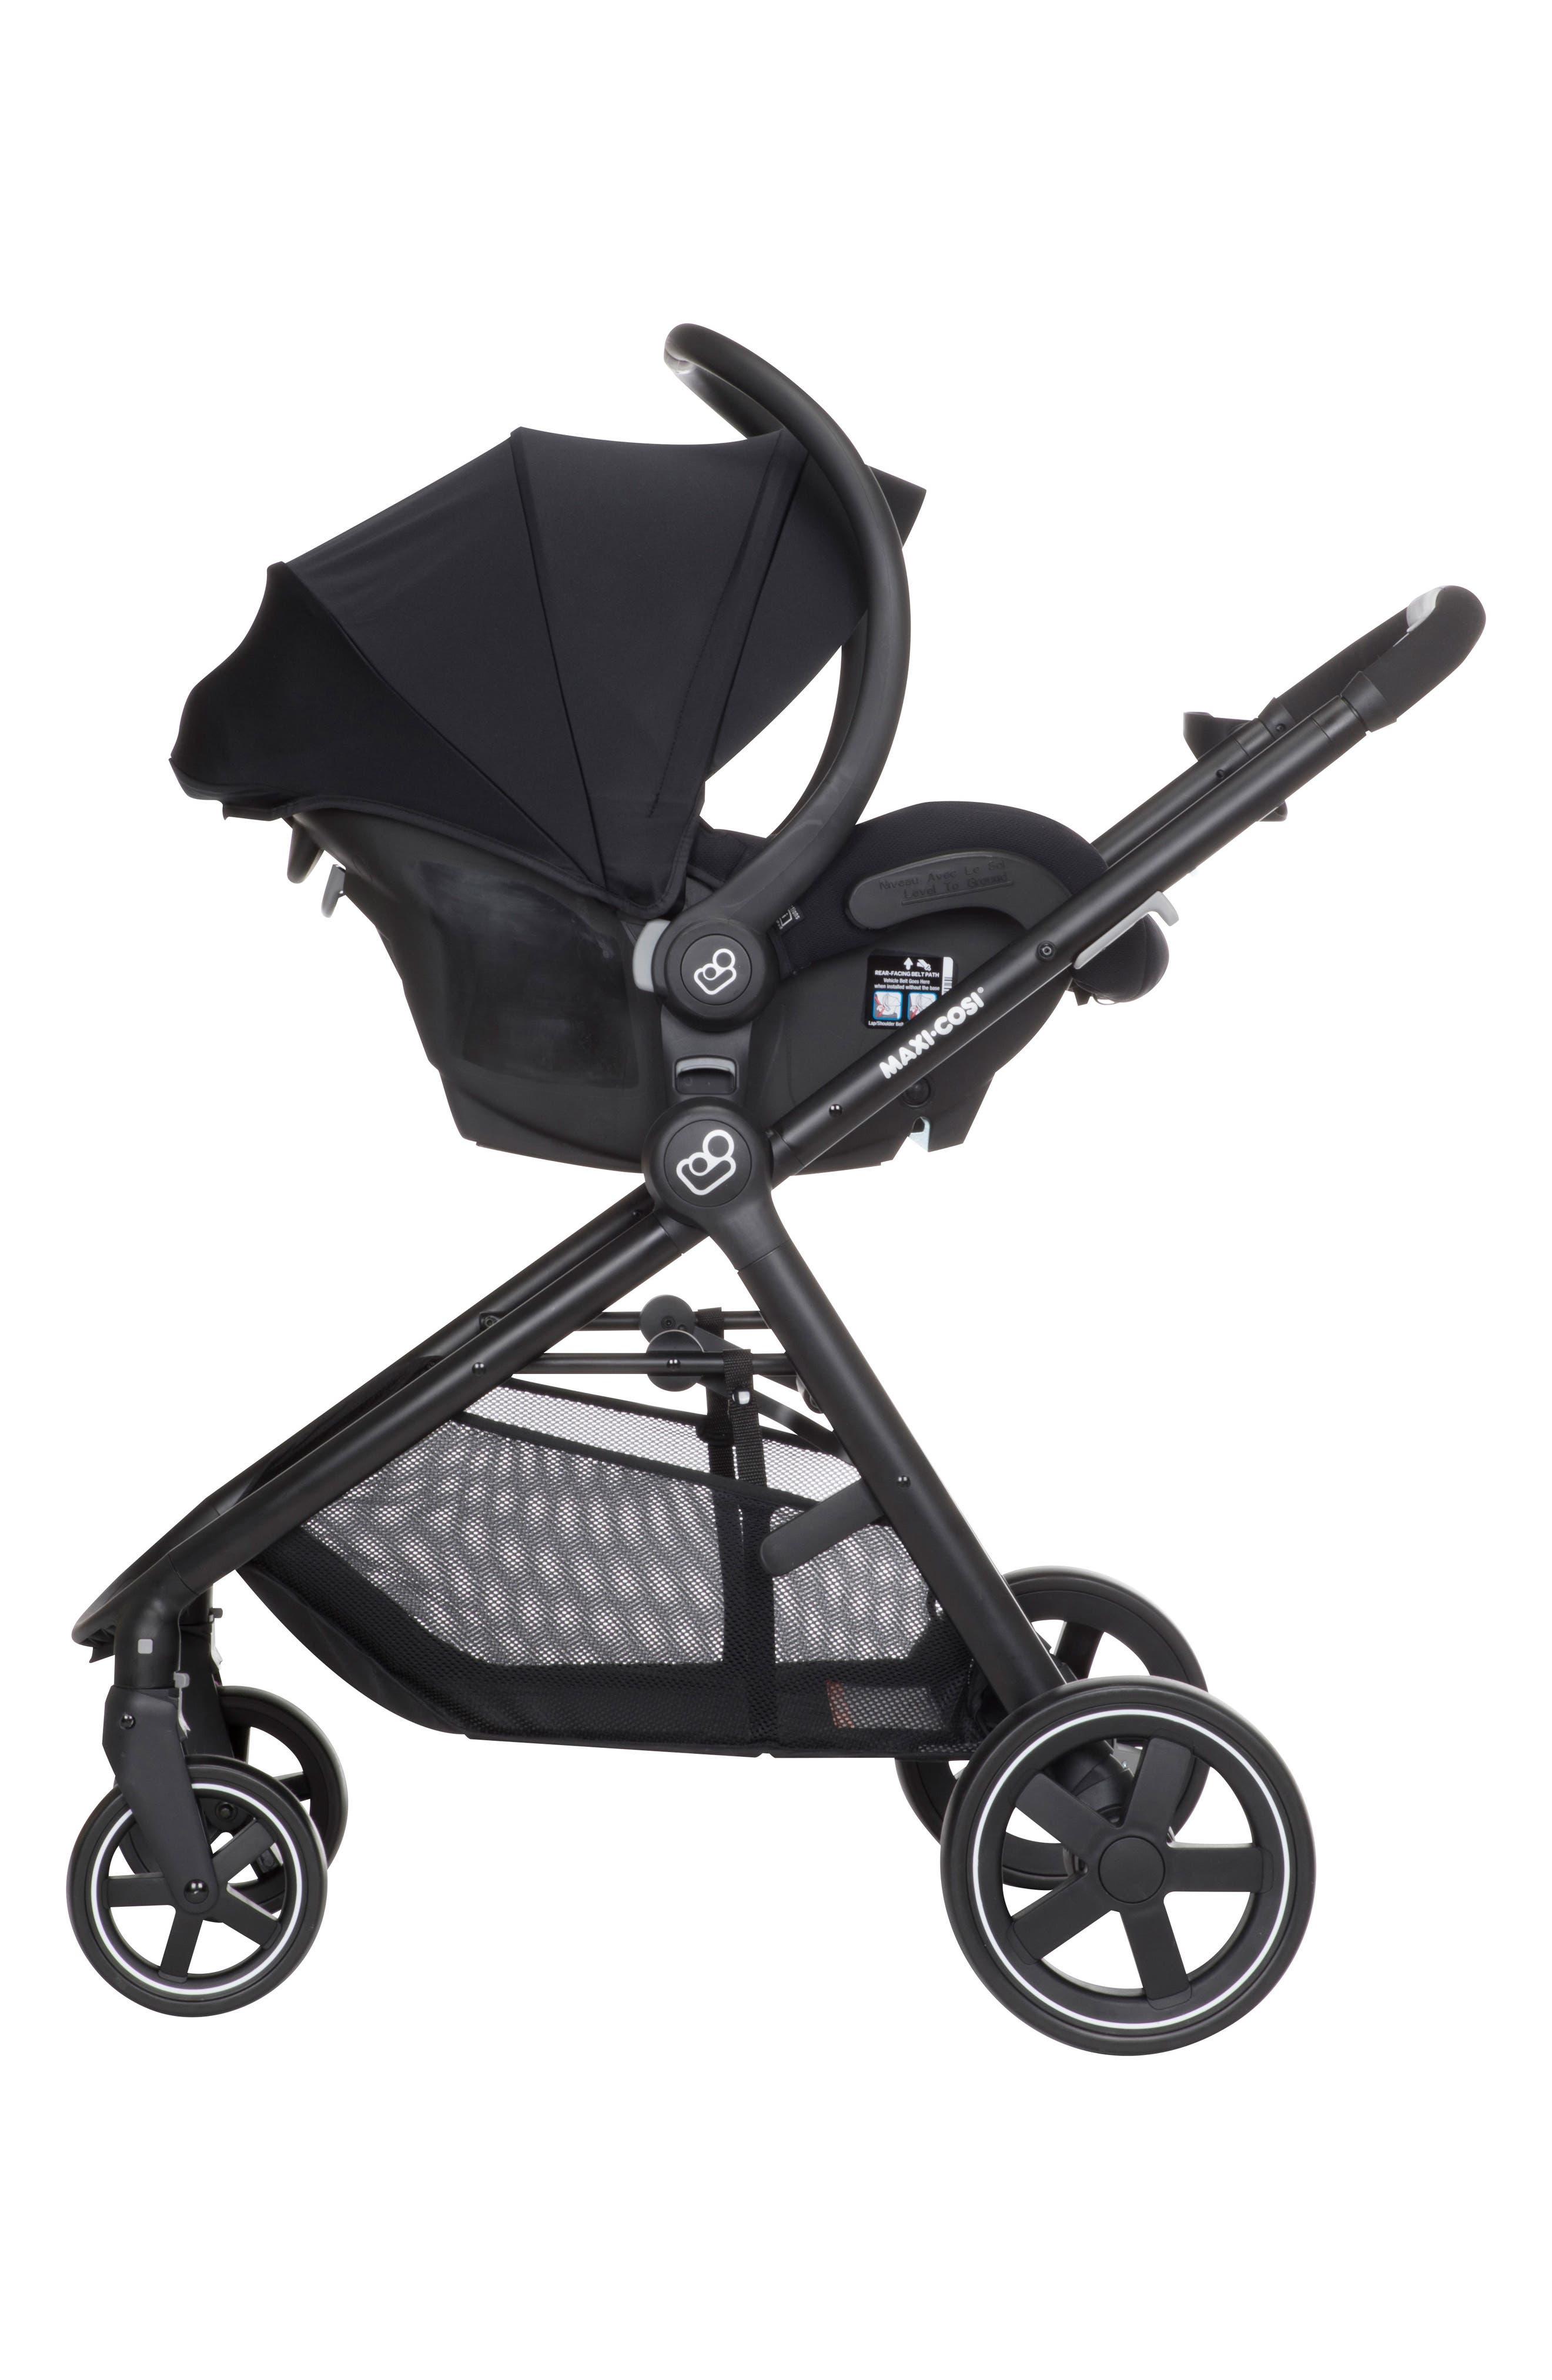 5-1 Mico 30 Infant Car Seat & Zelia Stroller Modular Travel System,                             Alternate thumbnail 4, color,                             NIGHT BLACK